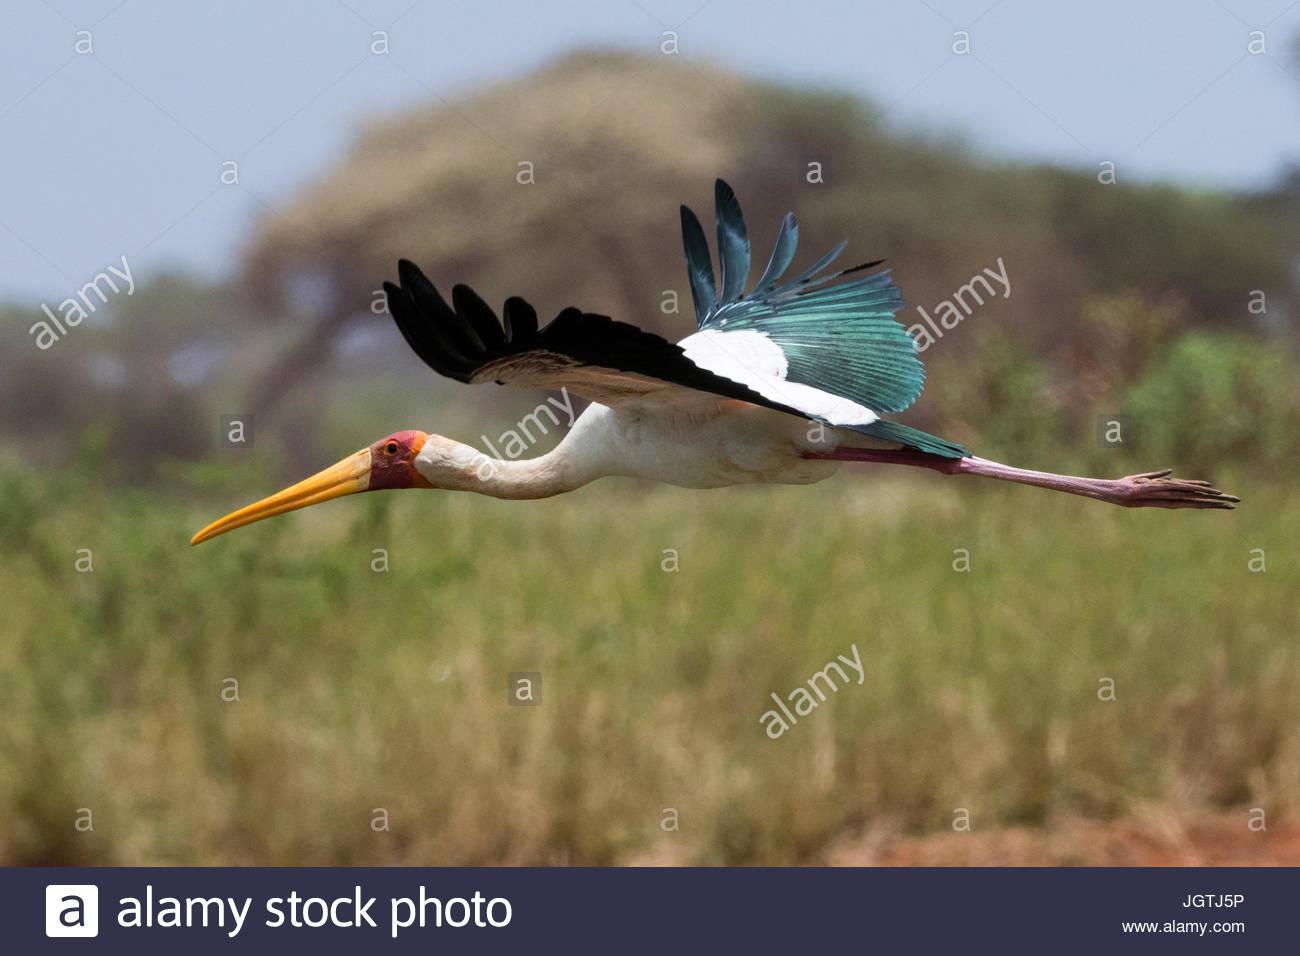 A yellow-billed stork, Mycteria ibis, in flight. - Stock Image